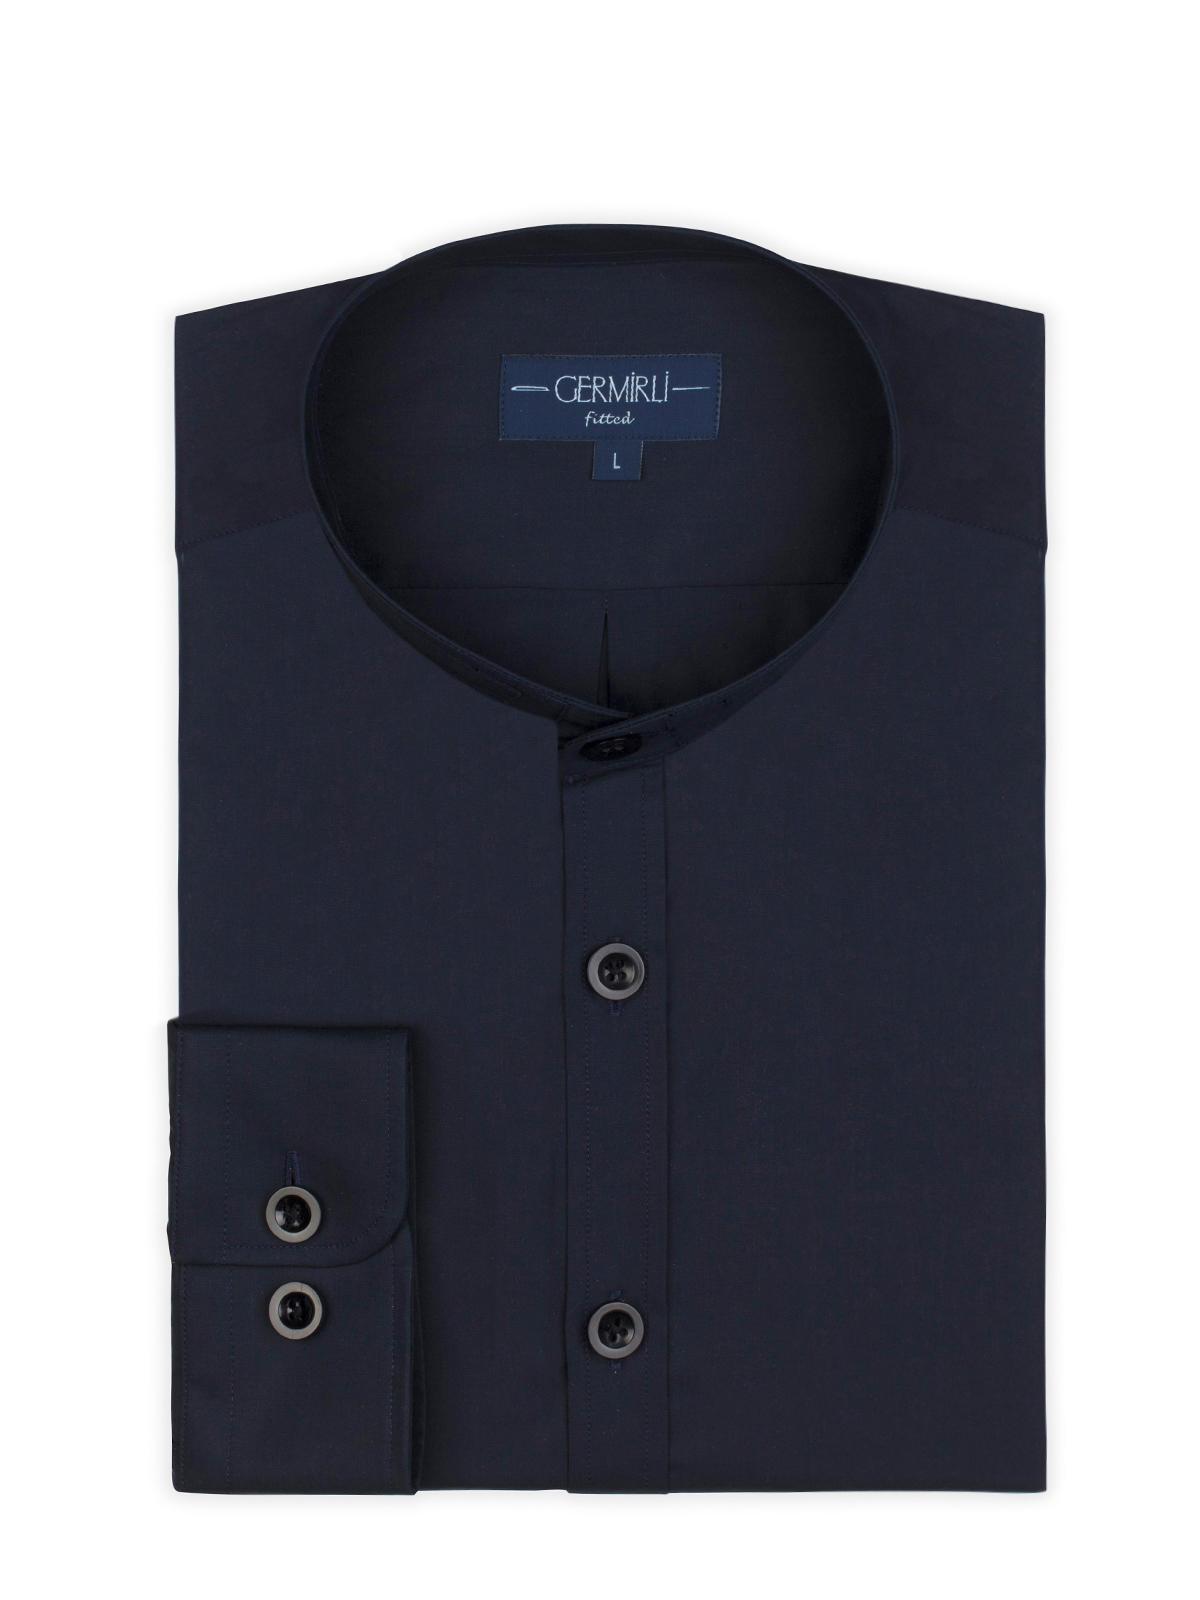 Germirli Navy Blue Grandad Collar Tailor Fit Shirt